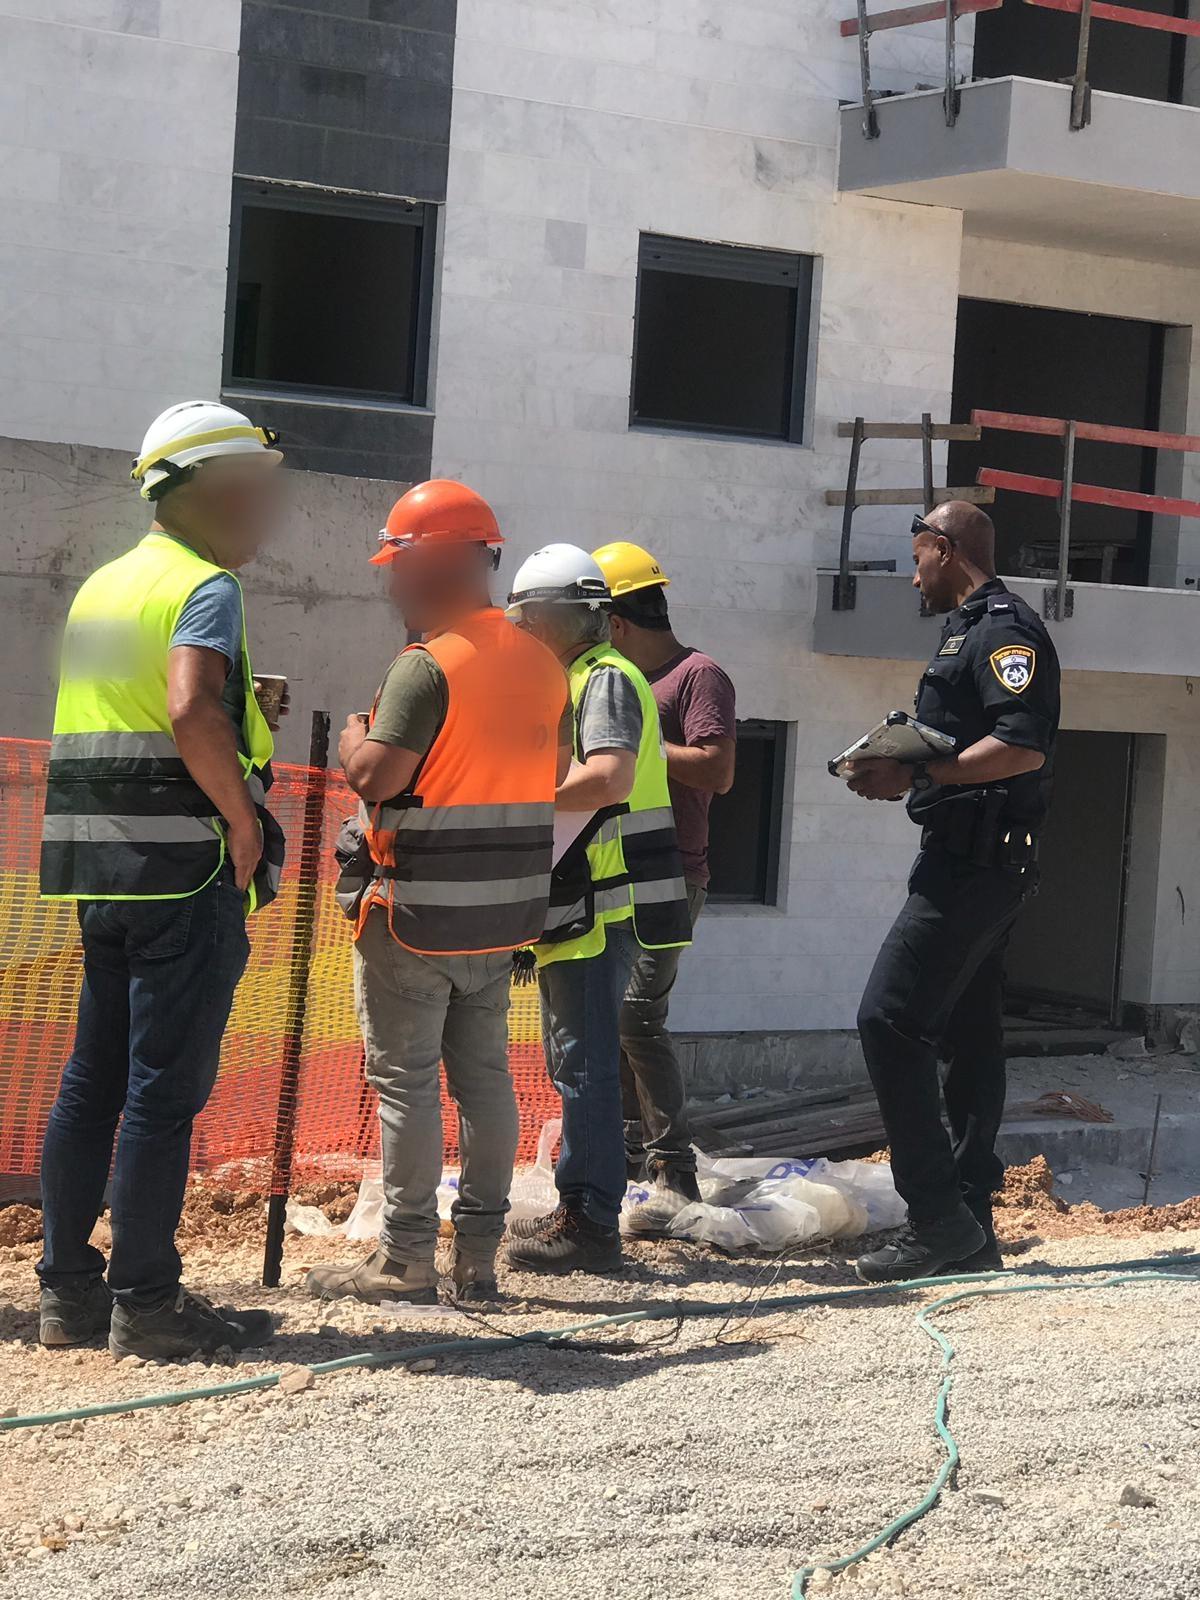 Photo of בליץ של המשטרה על אתרי בנייה בראש העין הביא לחשיפת ליקויי בטיחות חמורים